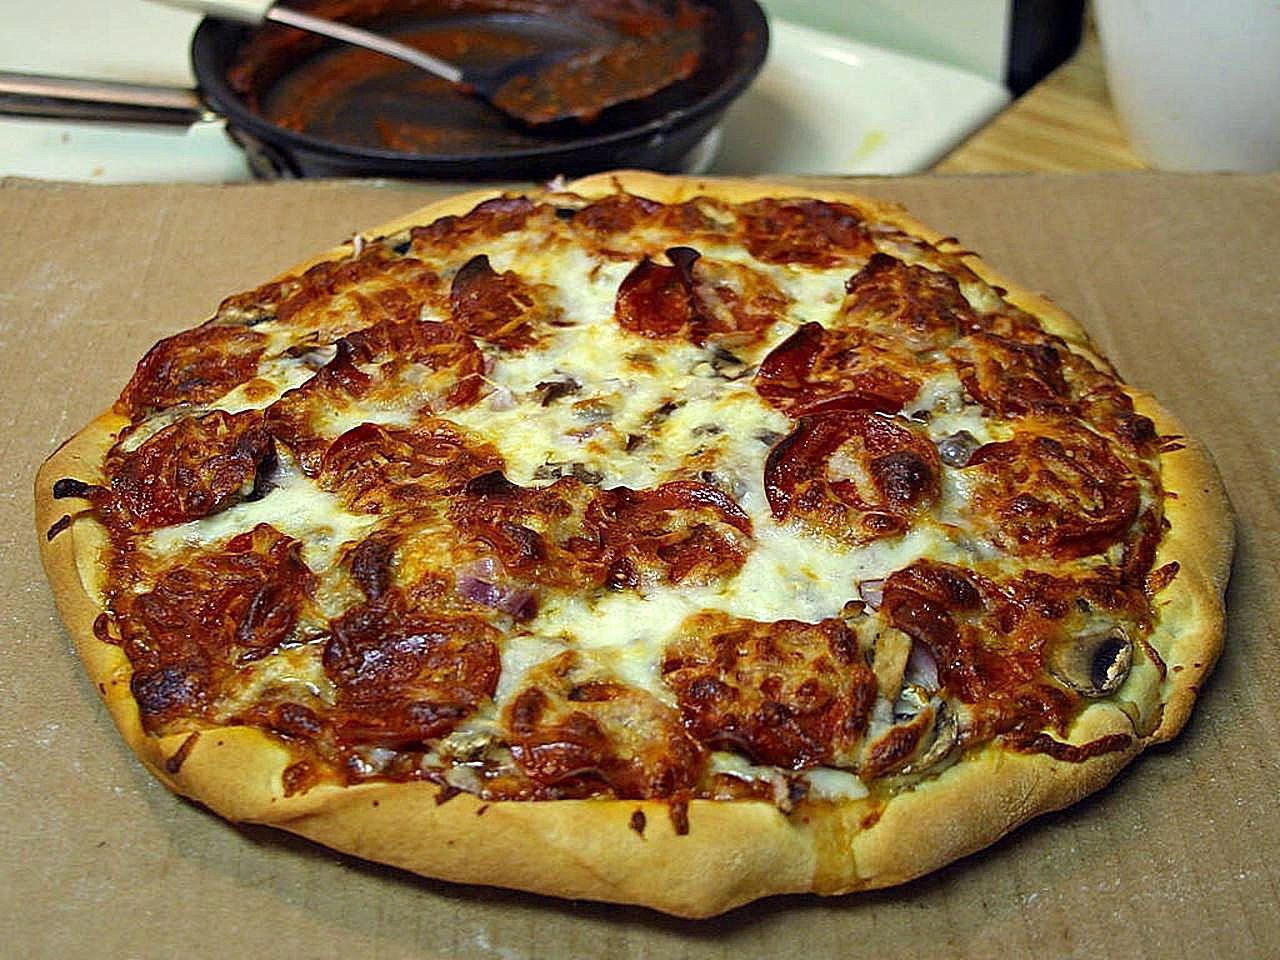 File Pepperoni pizza fast food jpg Wikimedia Commons